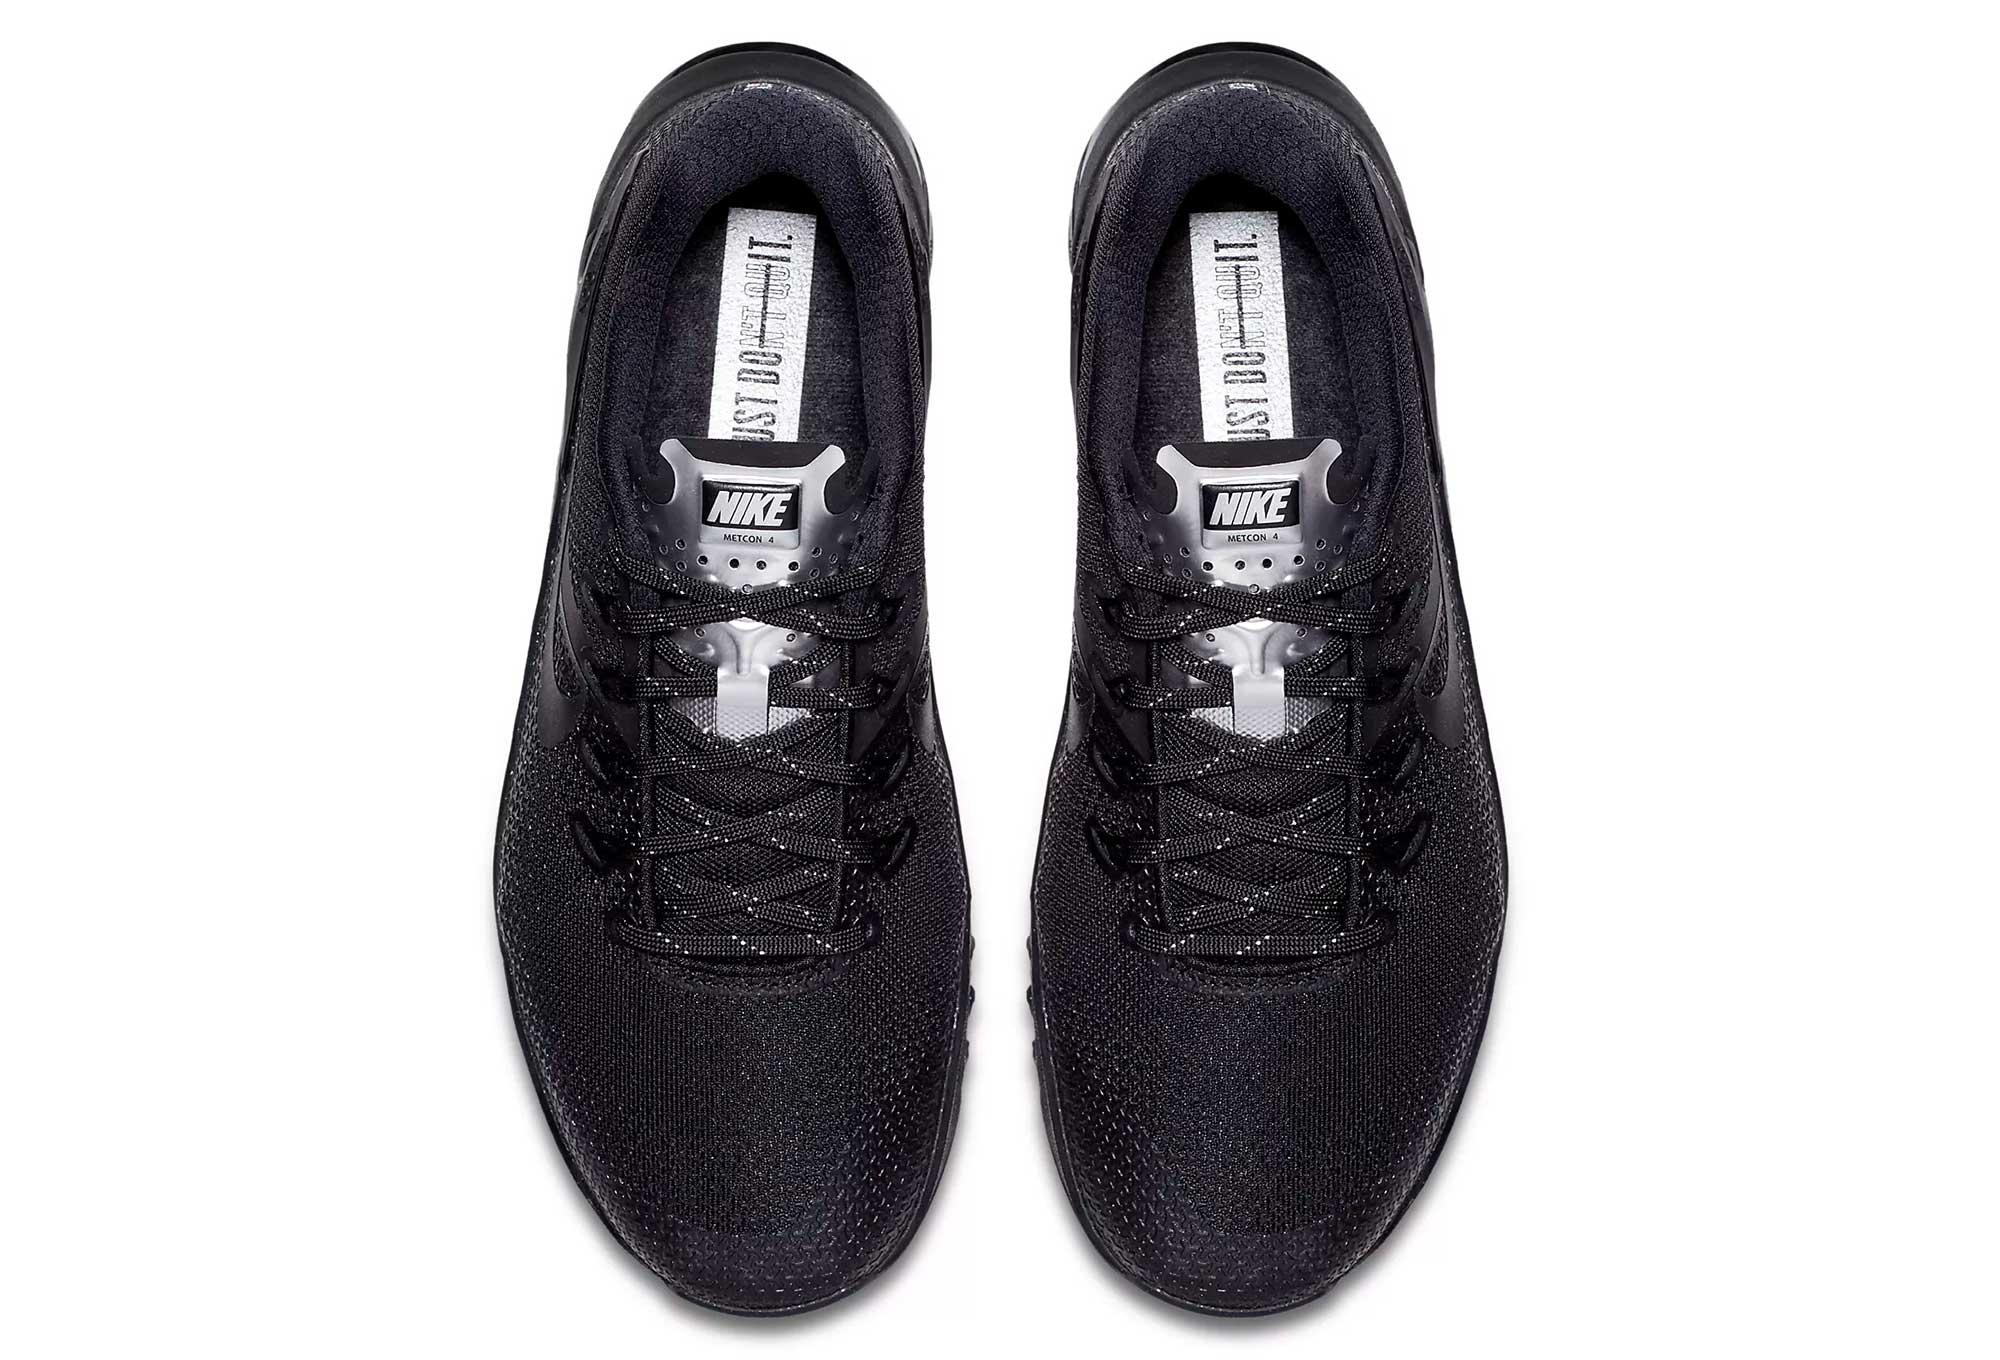 90ce22fa6653 Nike Metcon 4 Selfie Black Chrome Women